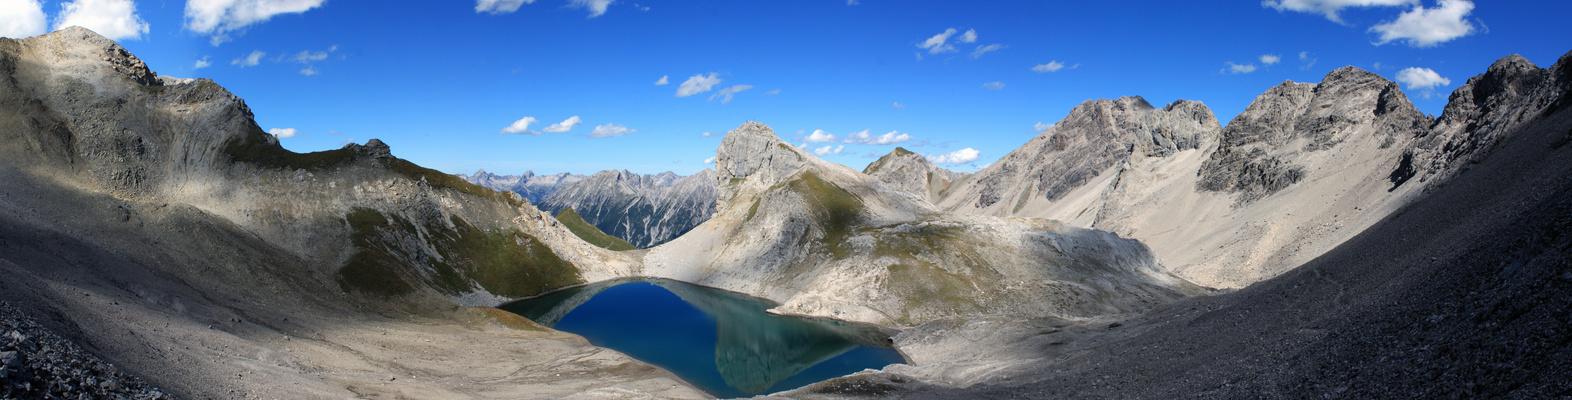 Wanderung im Lechtal Panorama